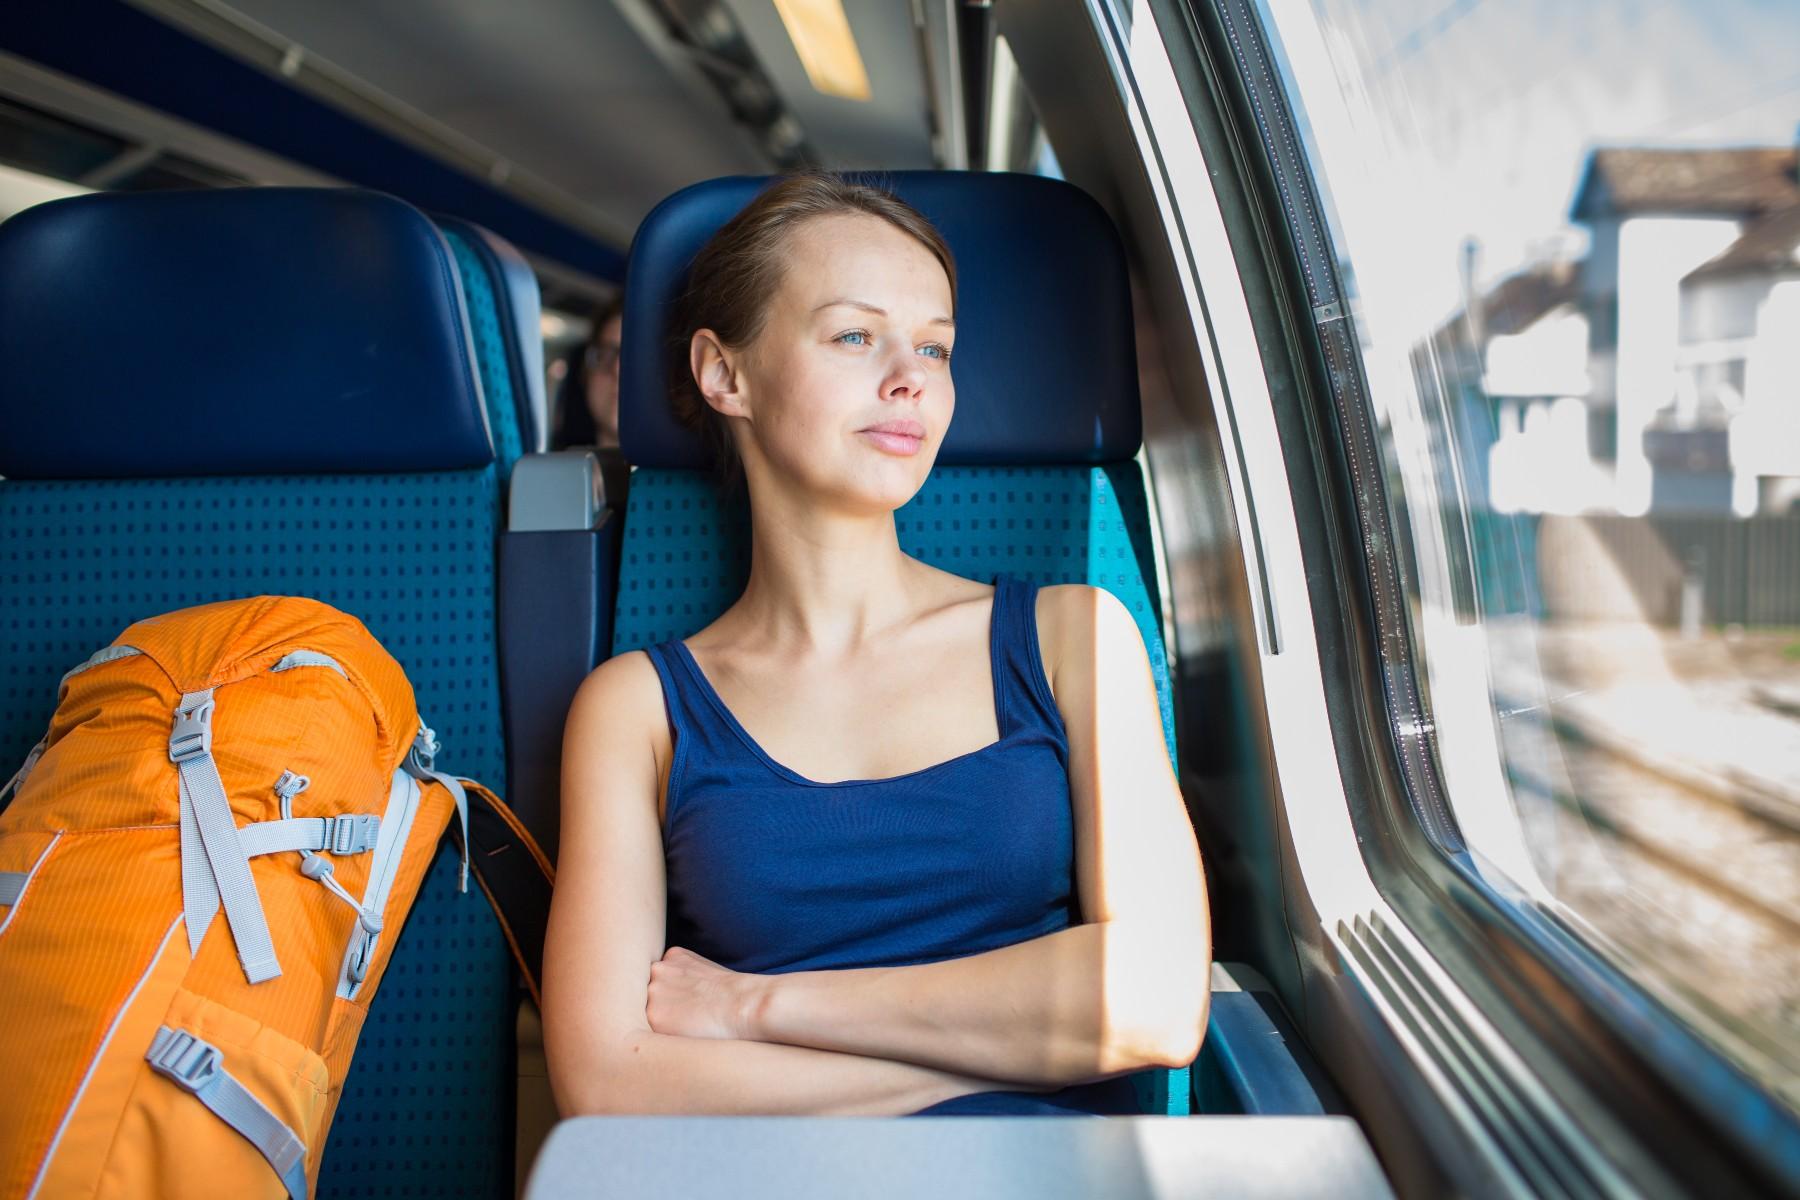 Switzerland holiday travel, woman on train